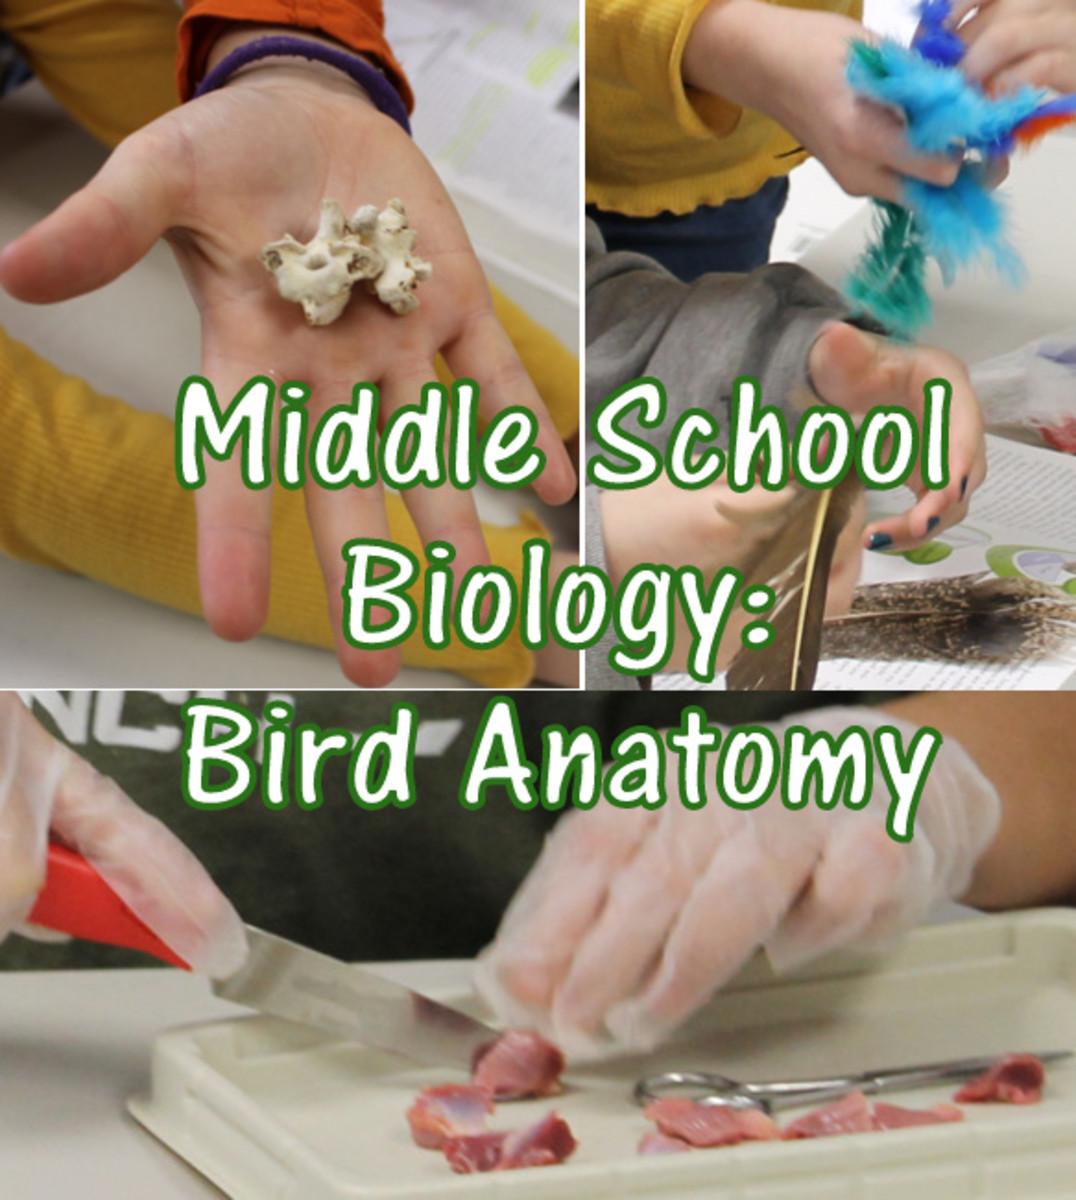 Christian Middle School Biology Lesson: Bird Anatomy